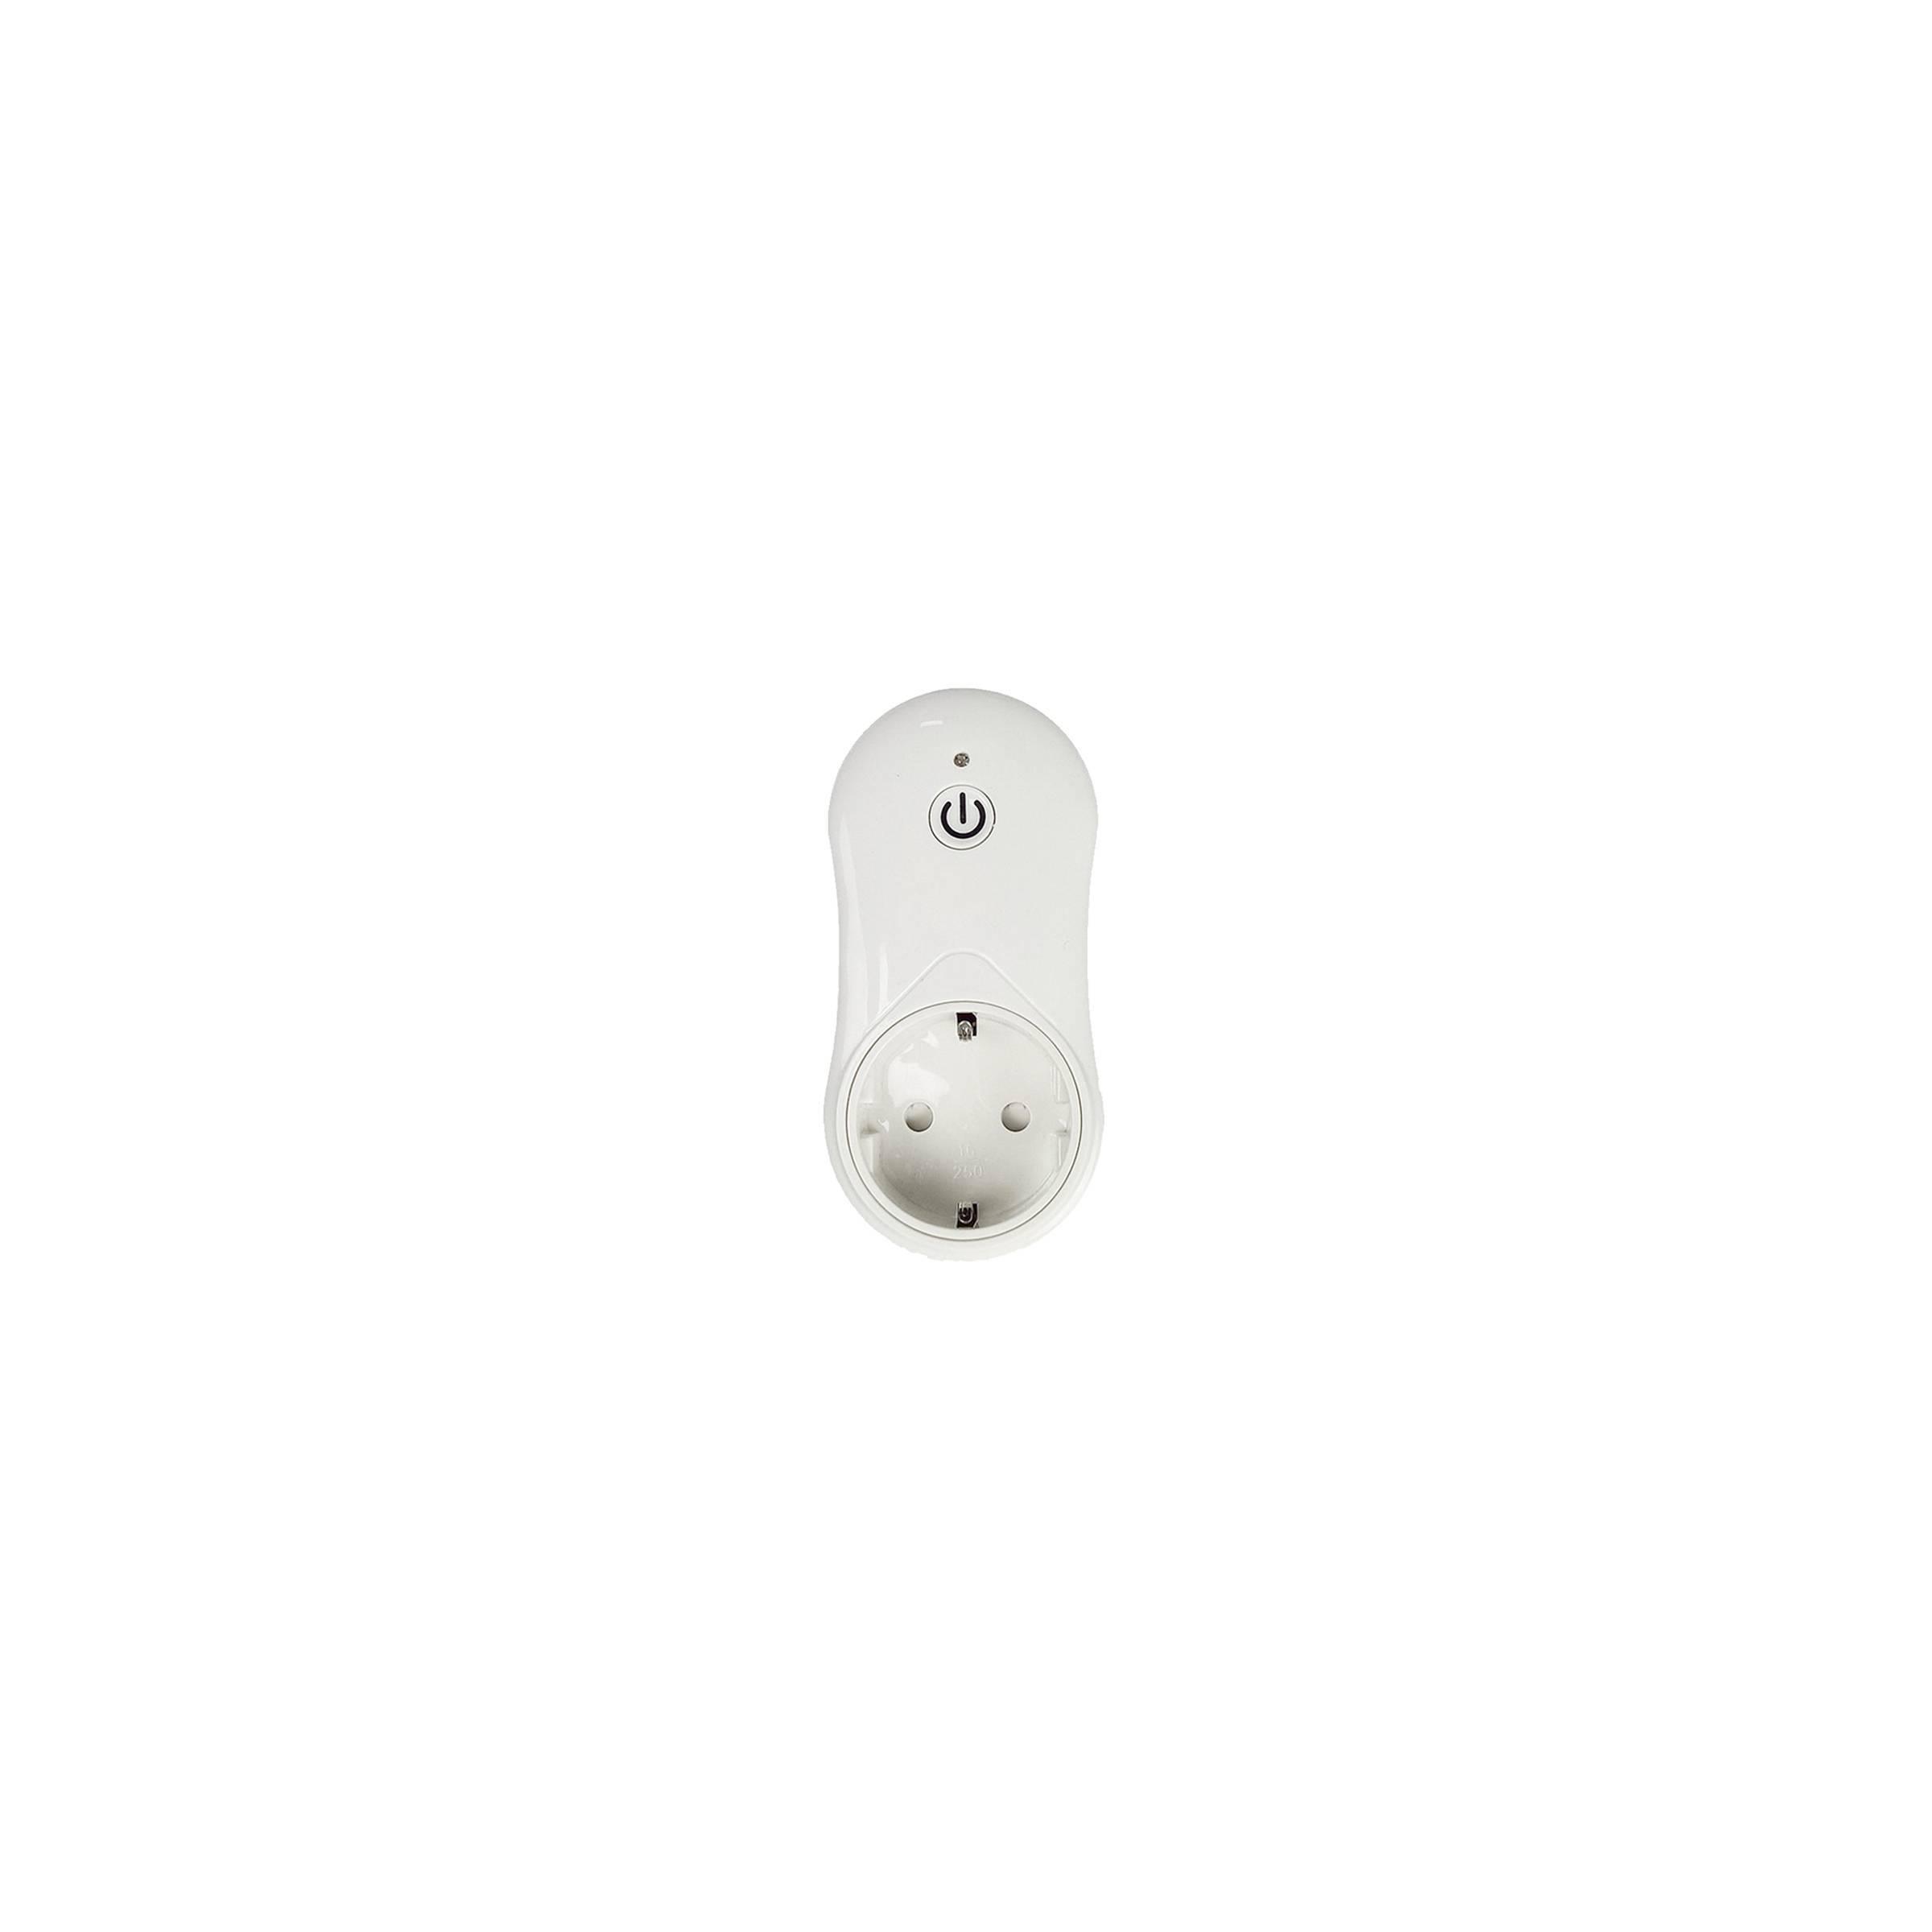 kina oem Smart strøm stik med wifi til amazon alexa, ifttt, ios og google home fra mackabler.dk